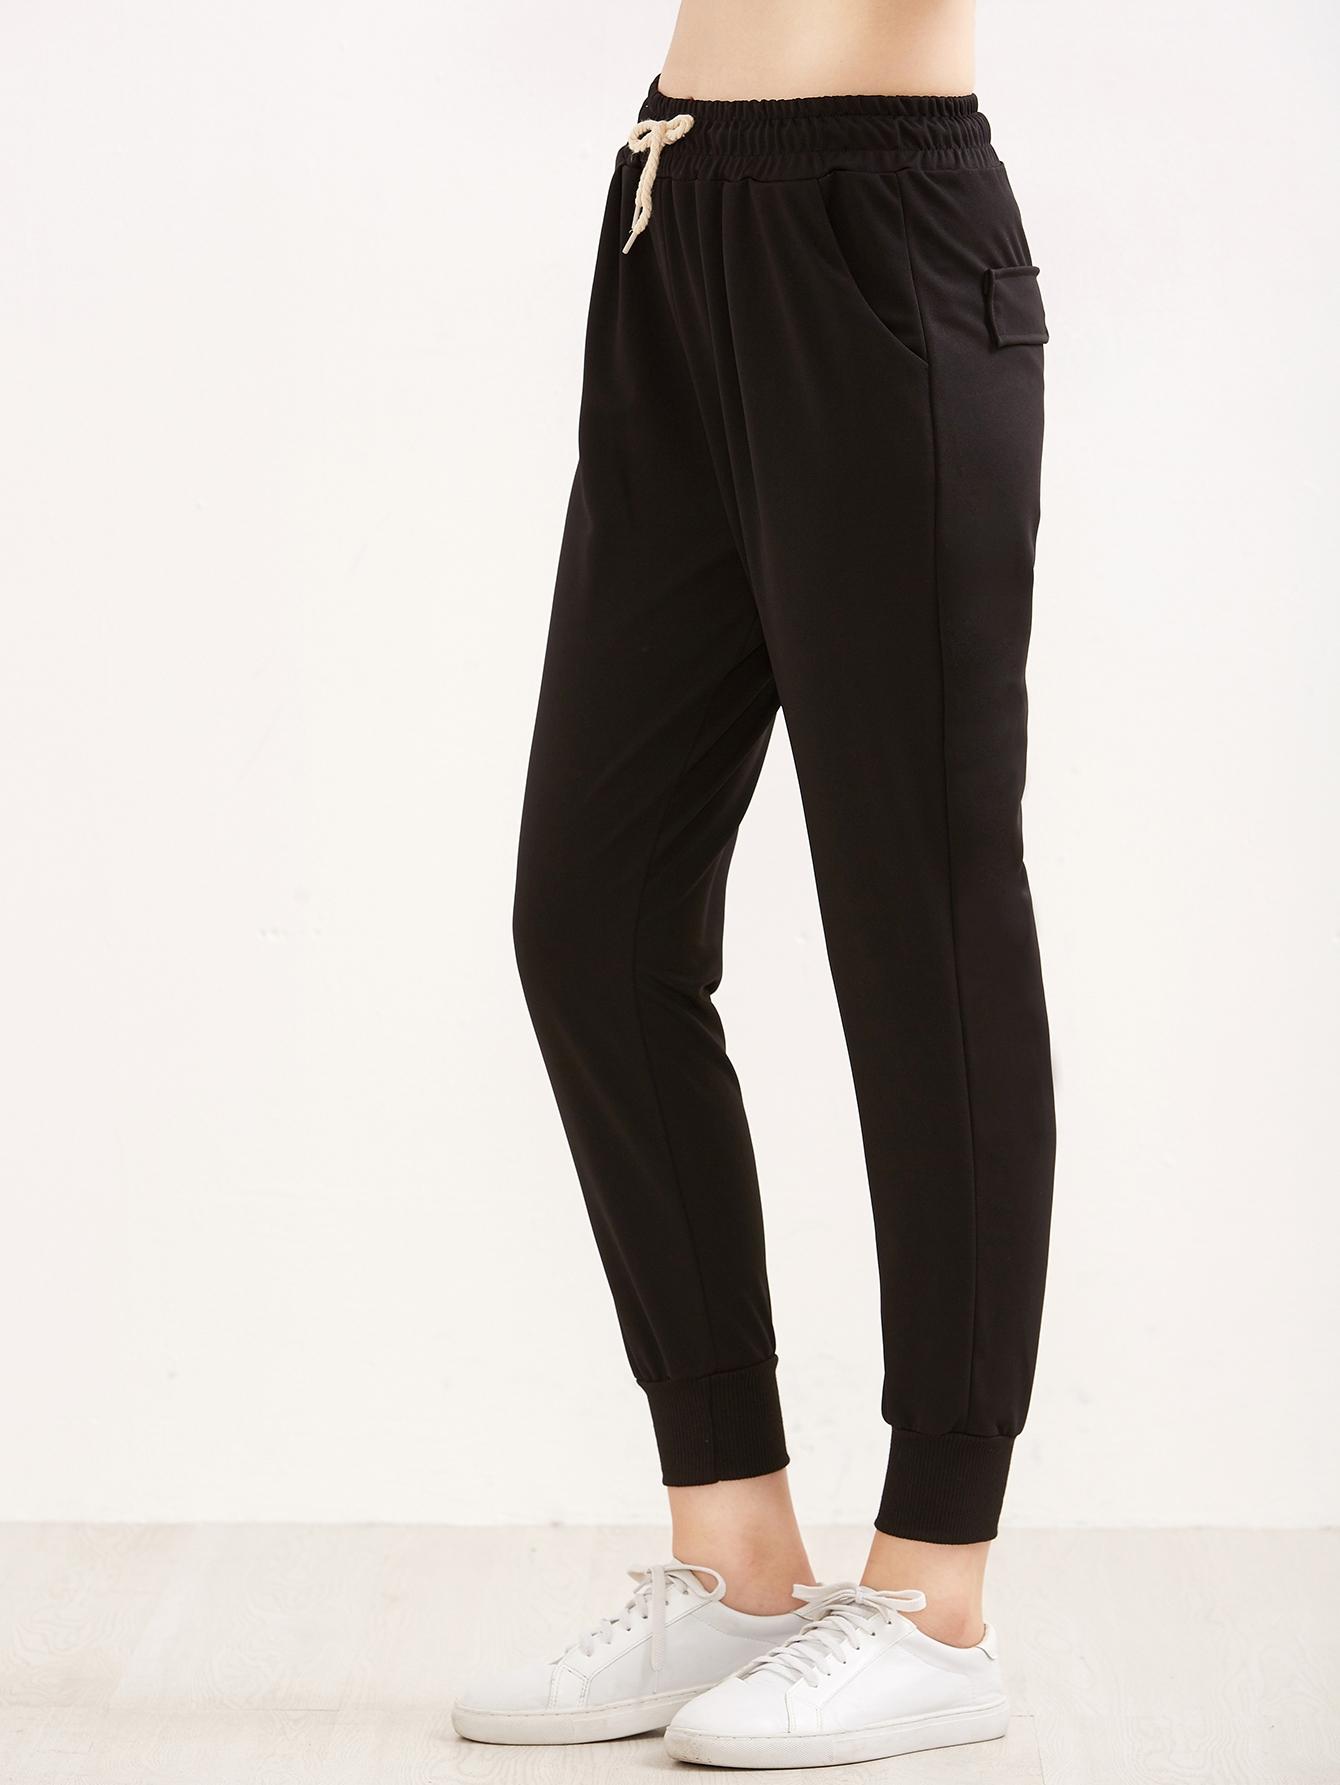 Black Drawstring Waist Pants With Pockets